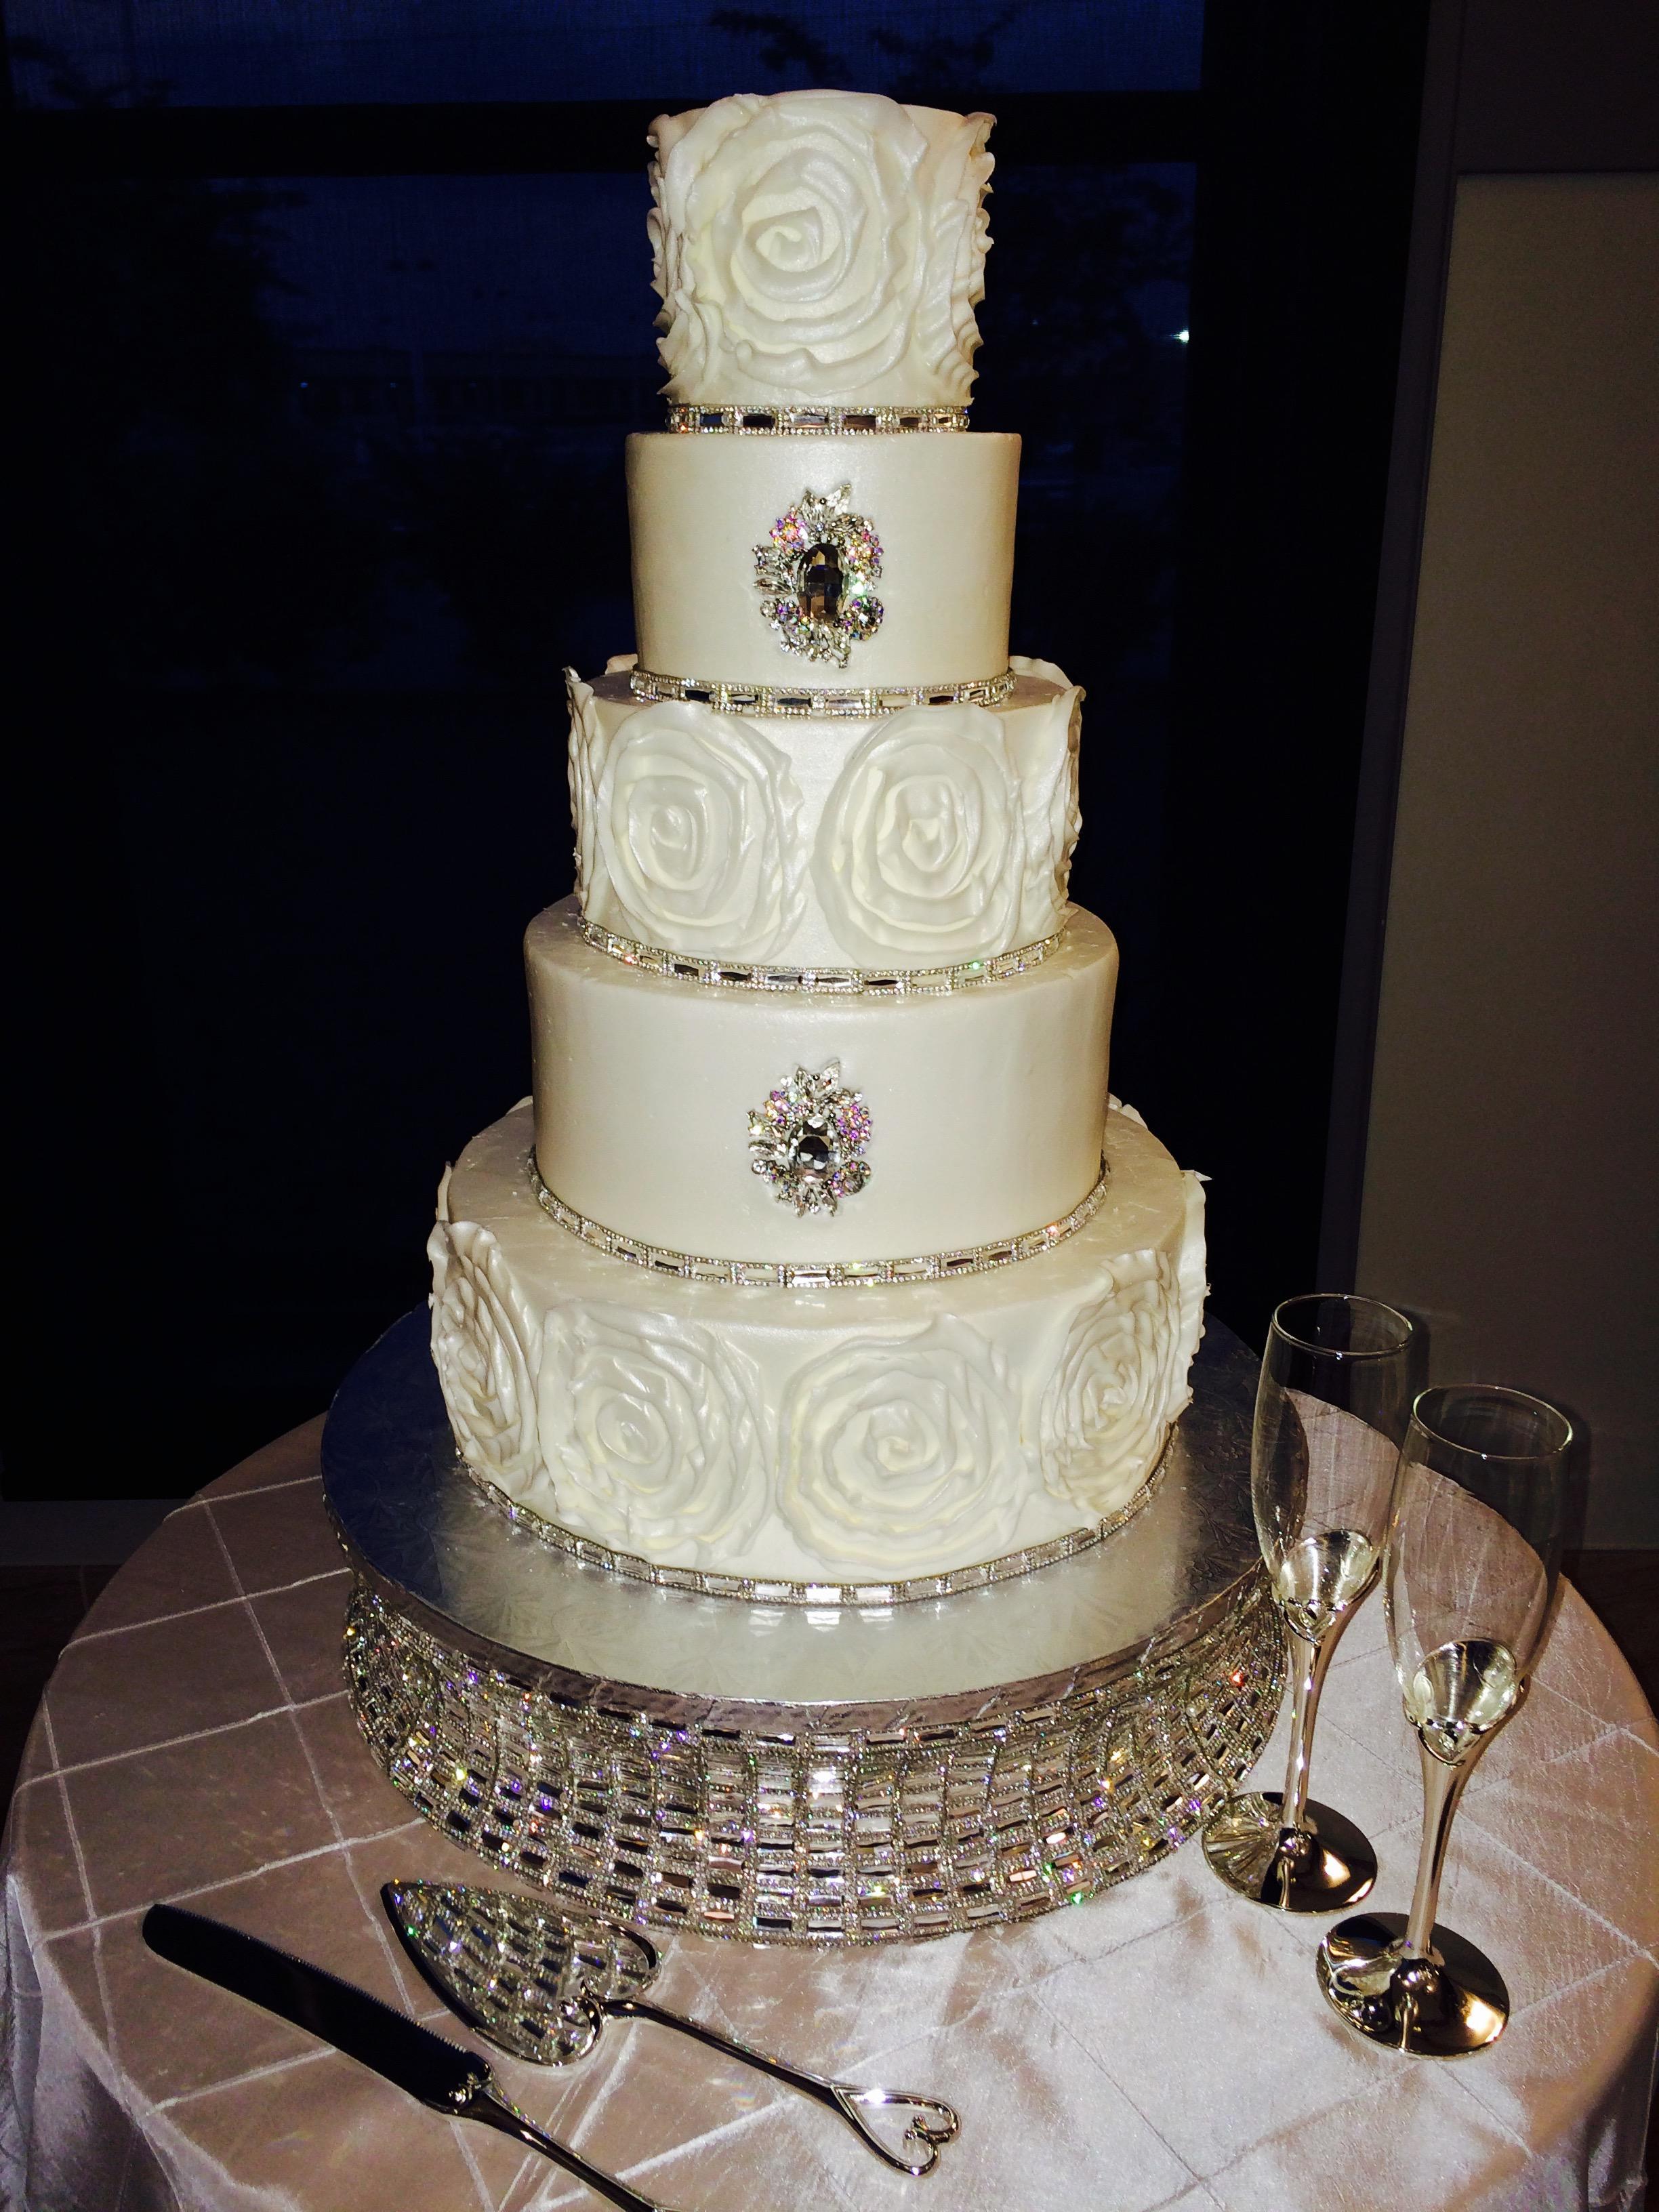 Wedding Cakes by Tammy Allen image 4